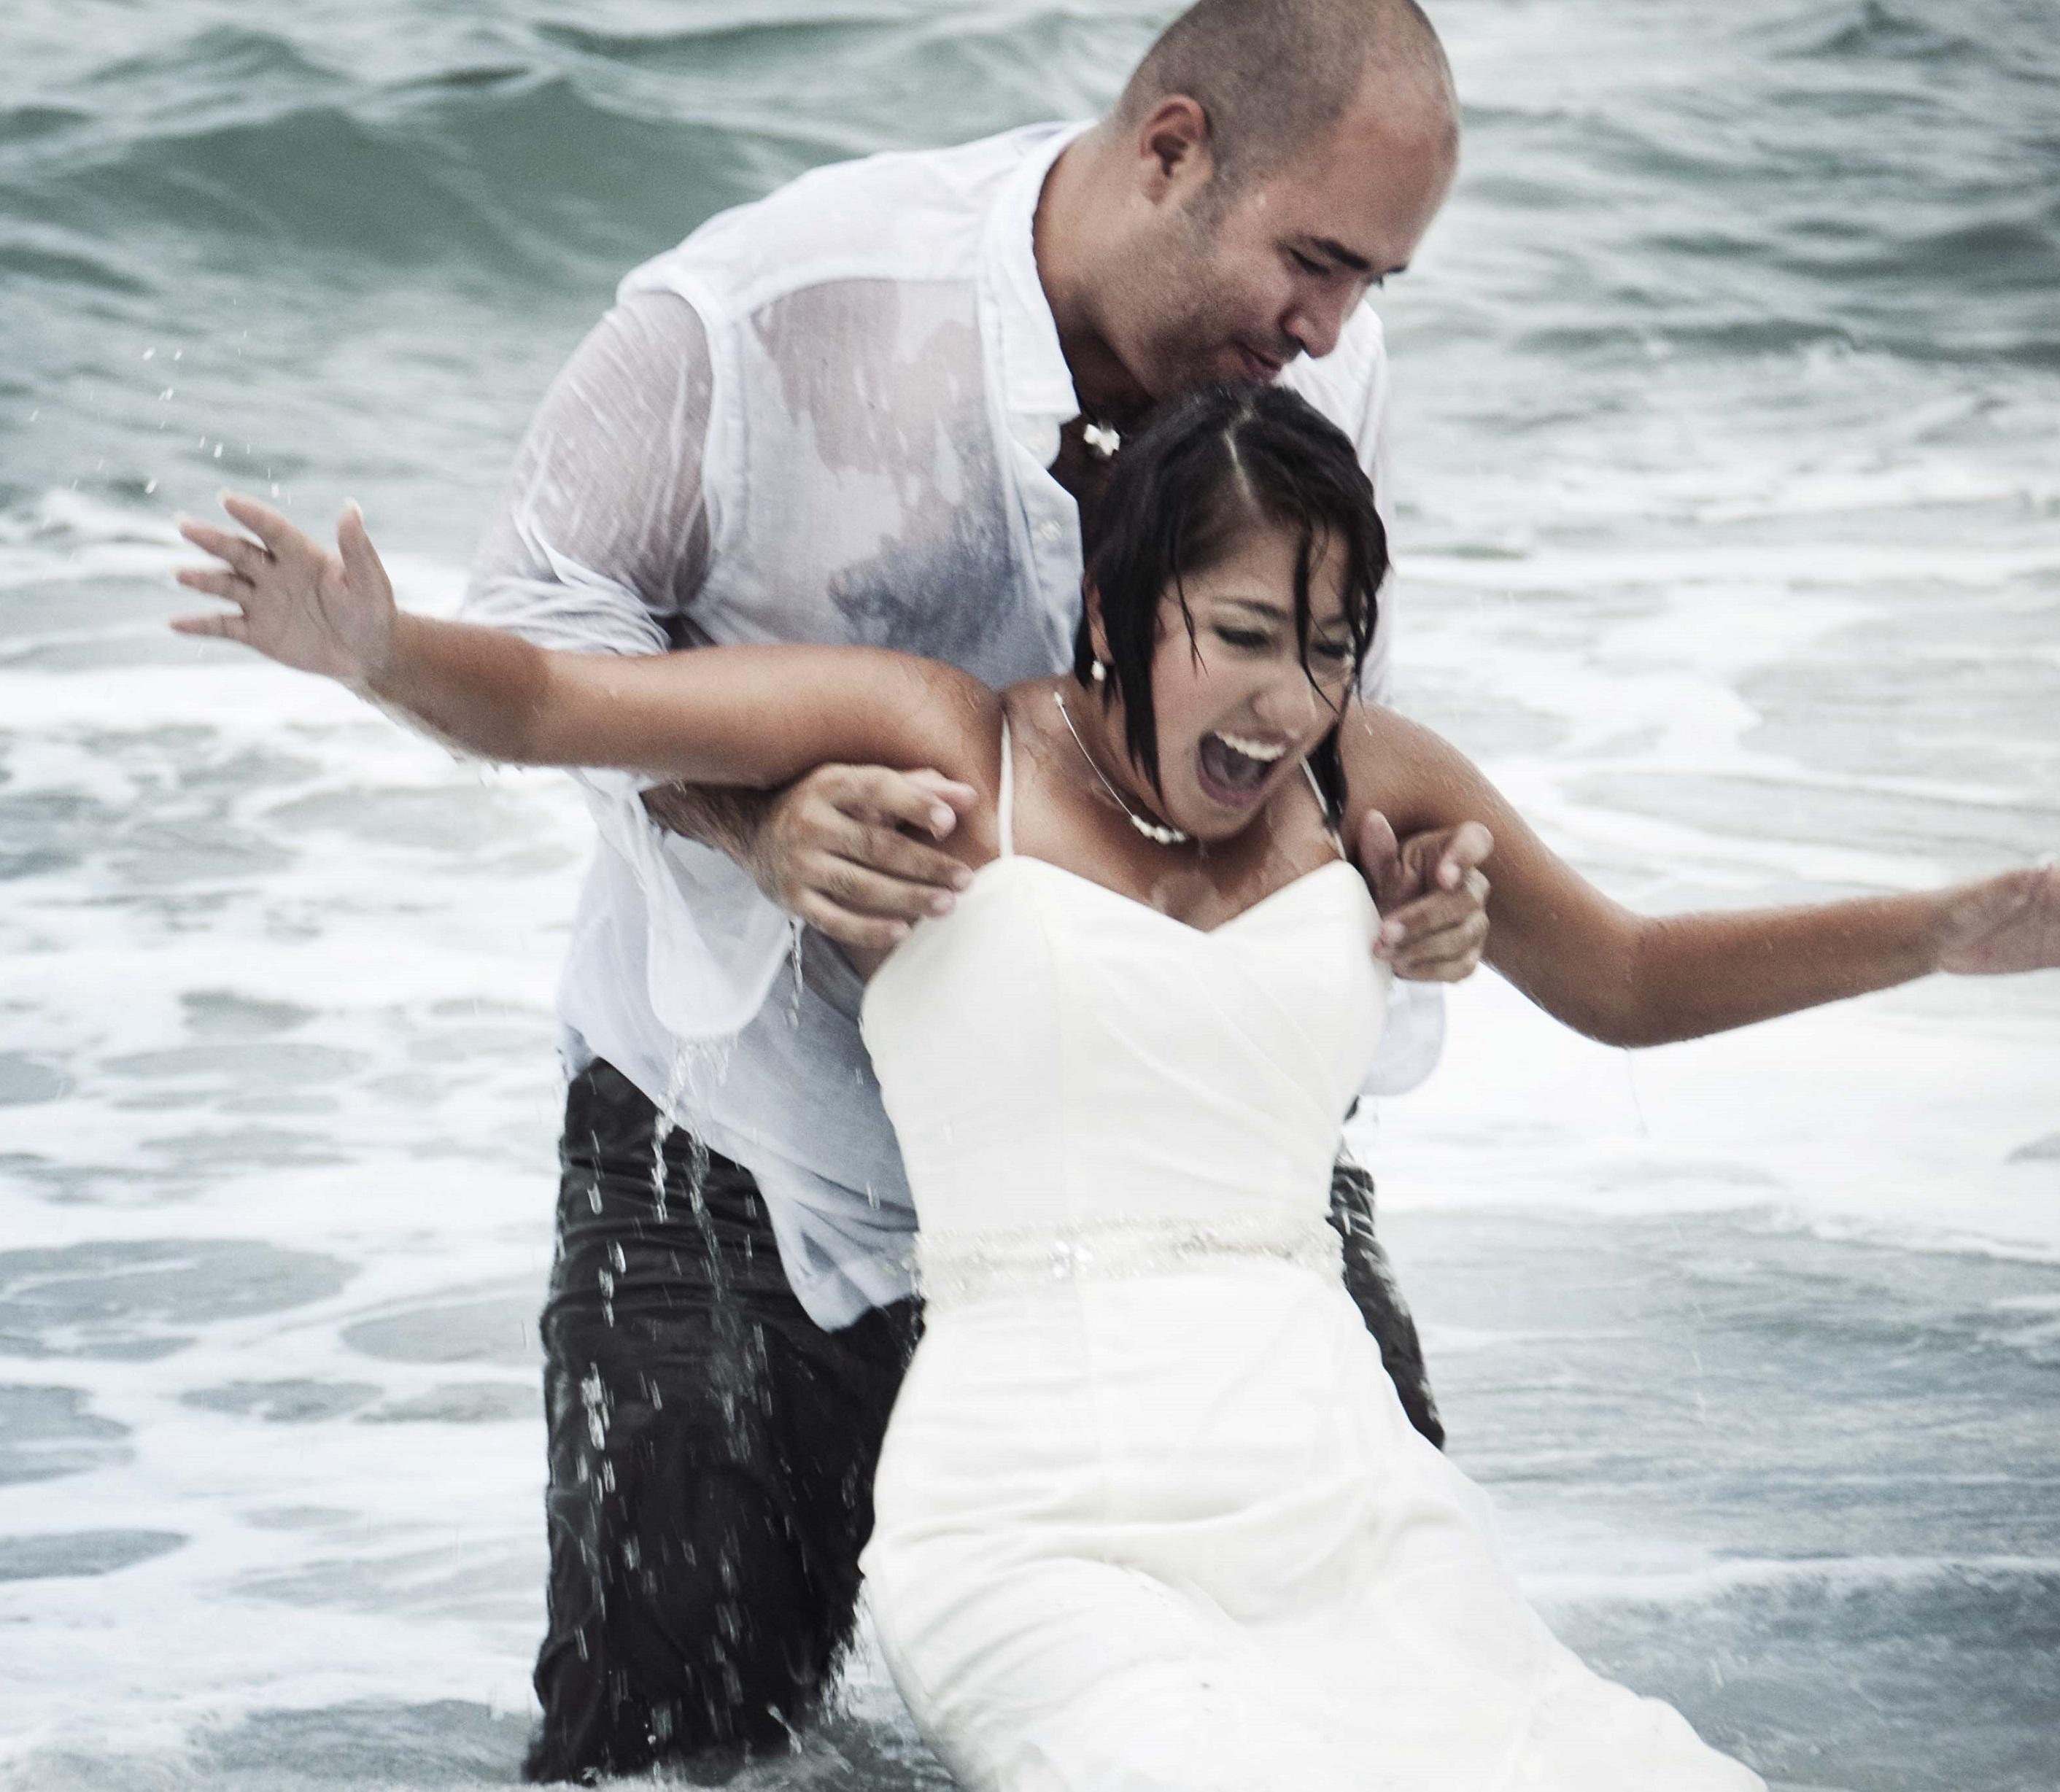 wedded couple having fun in water